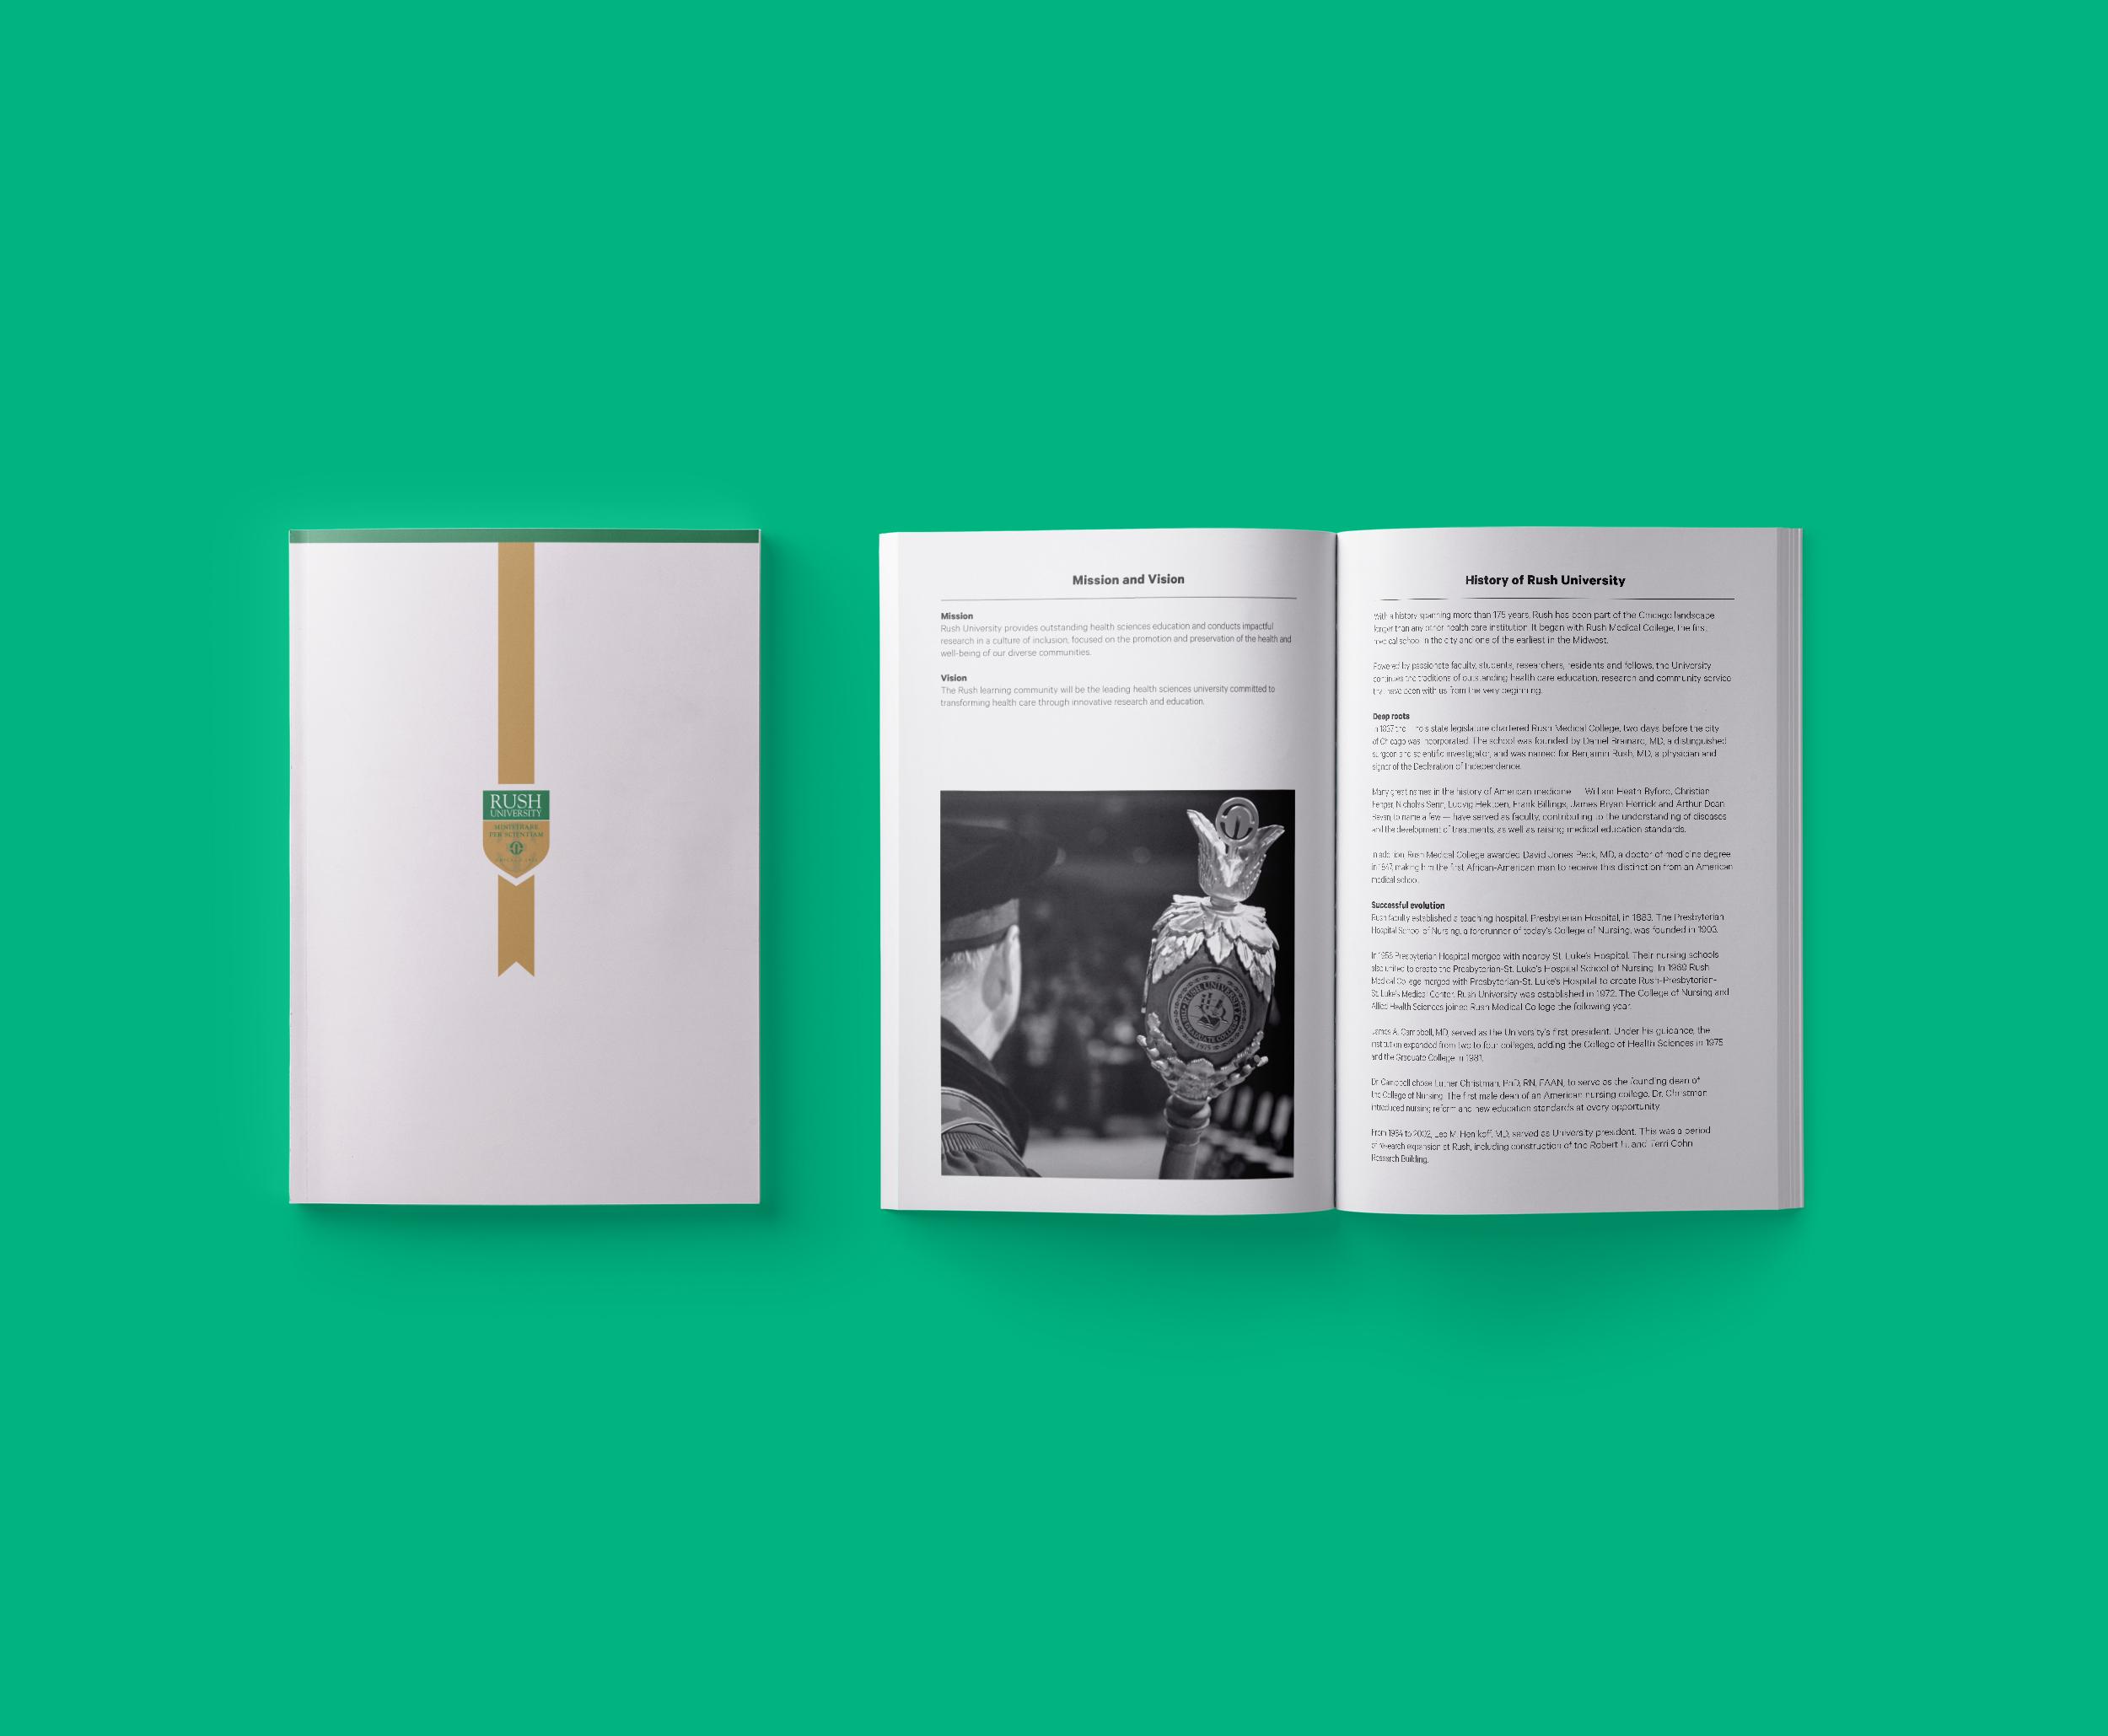 Program-A4-Mockup